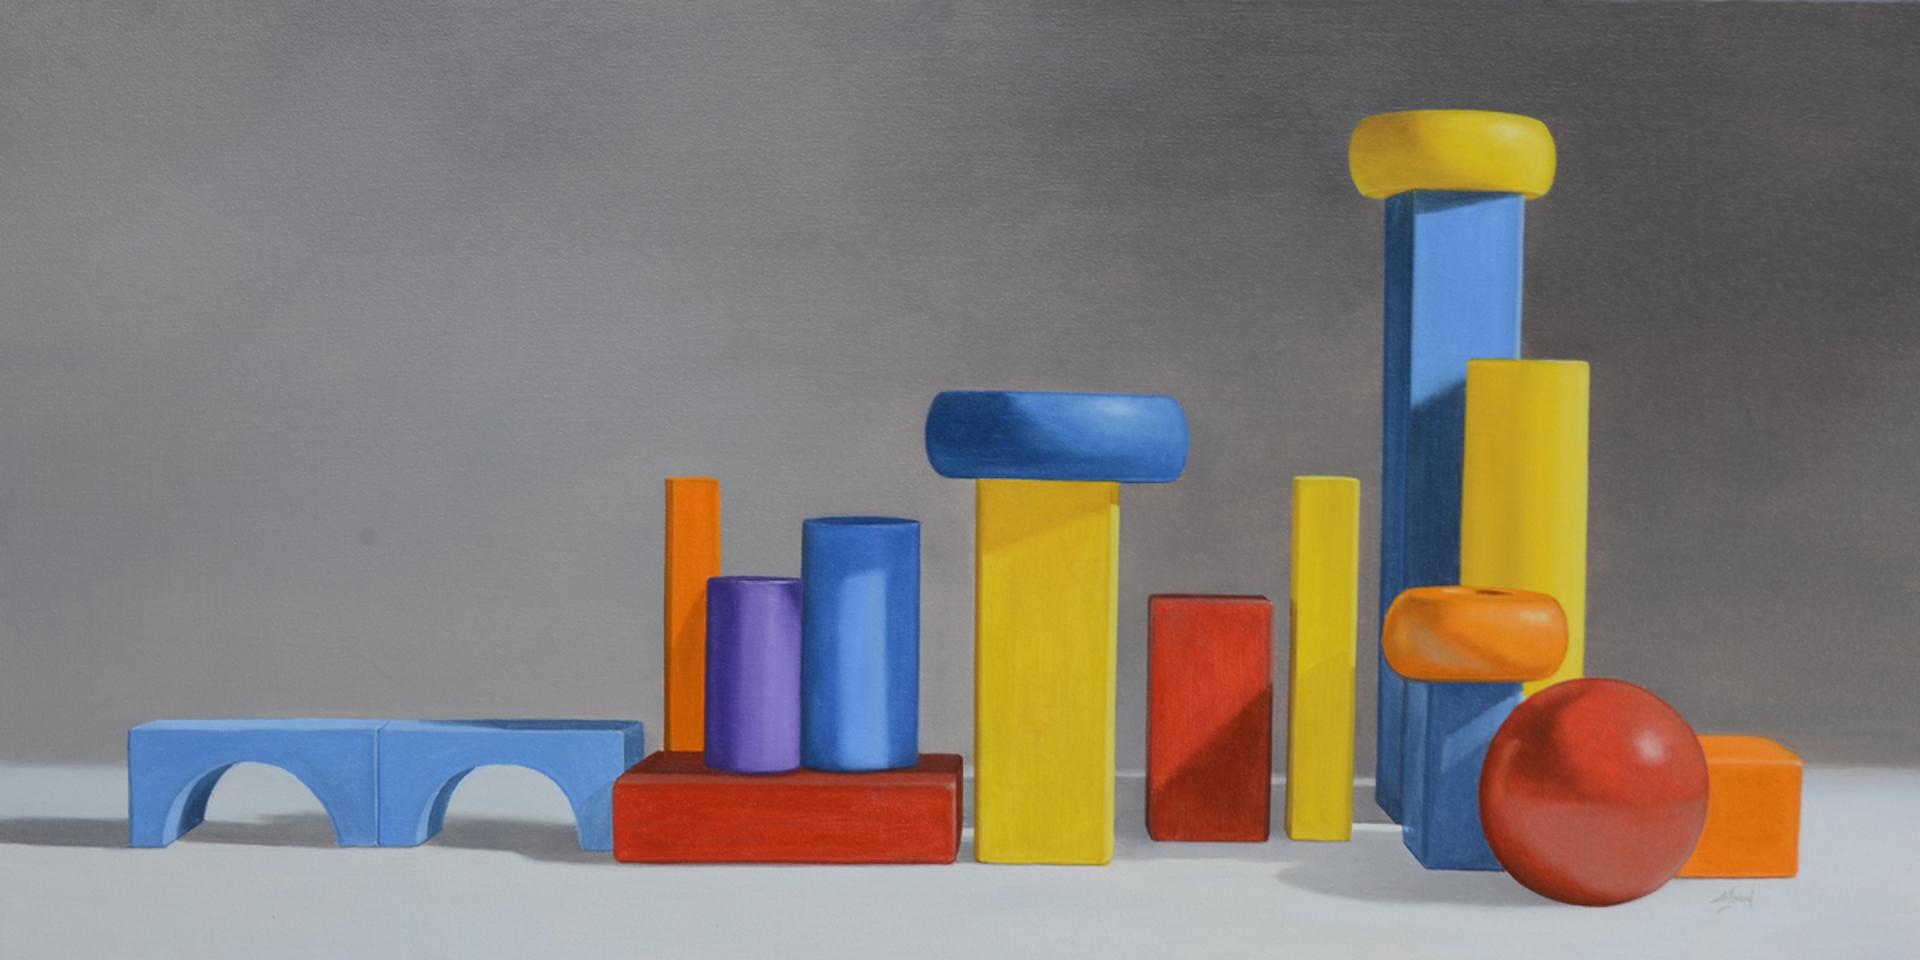 Skyline by Jim Molloy